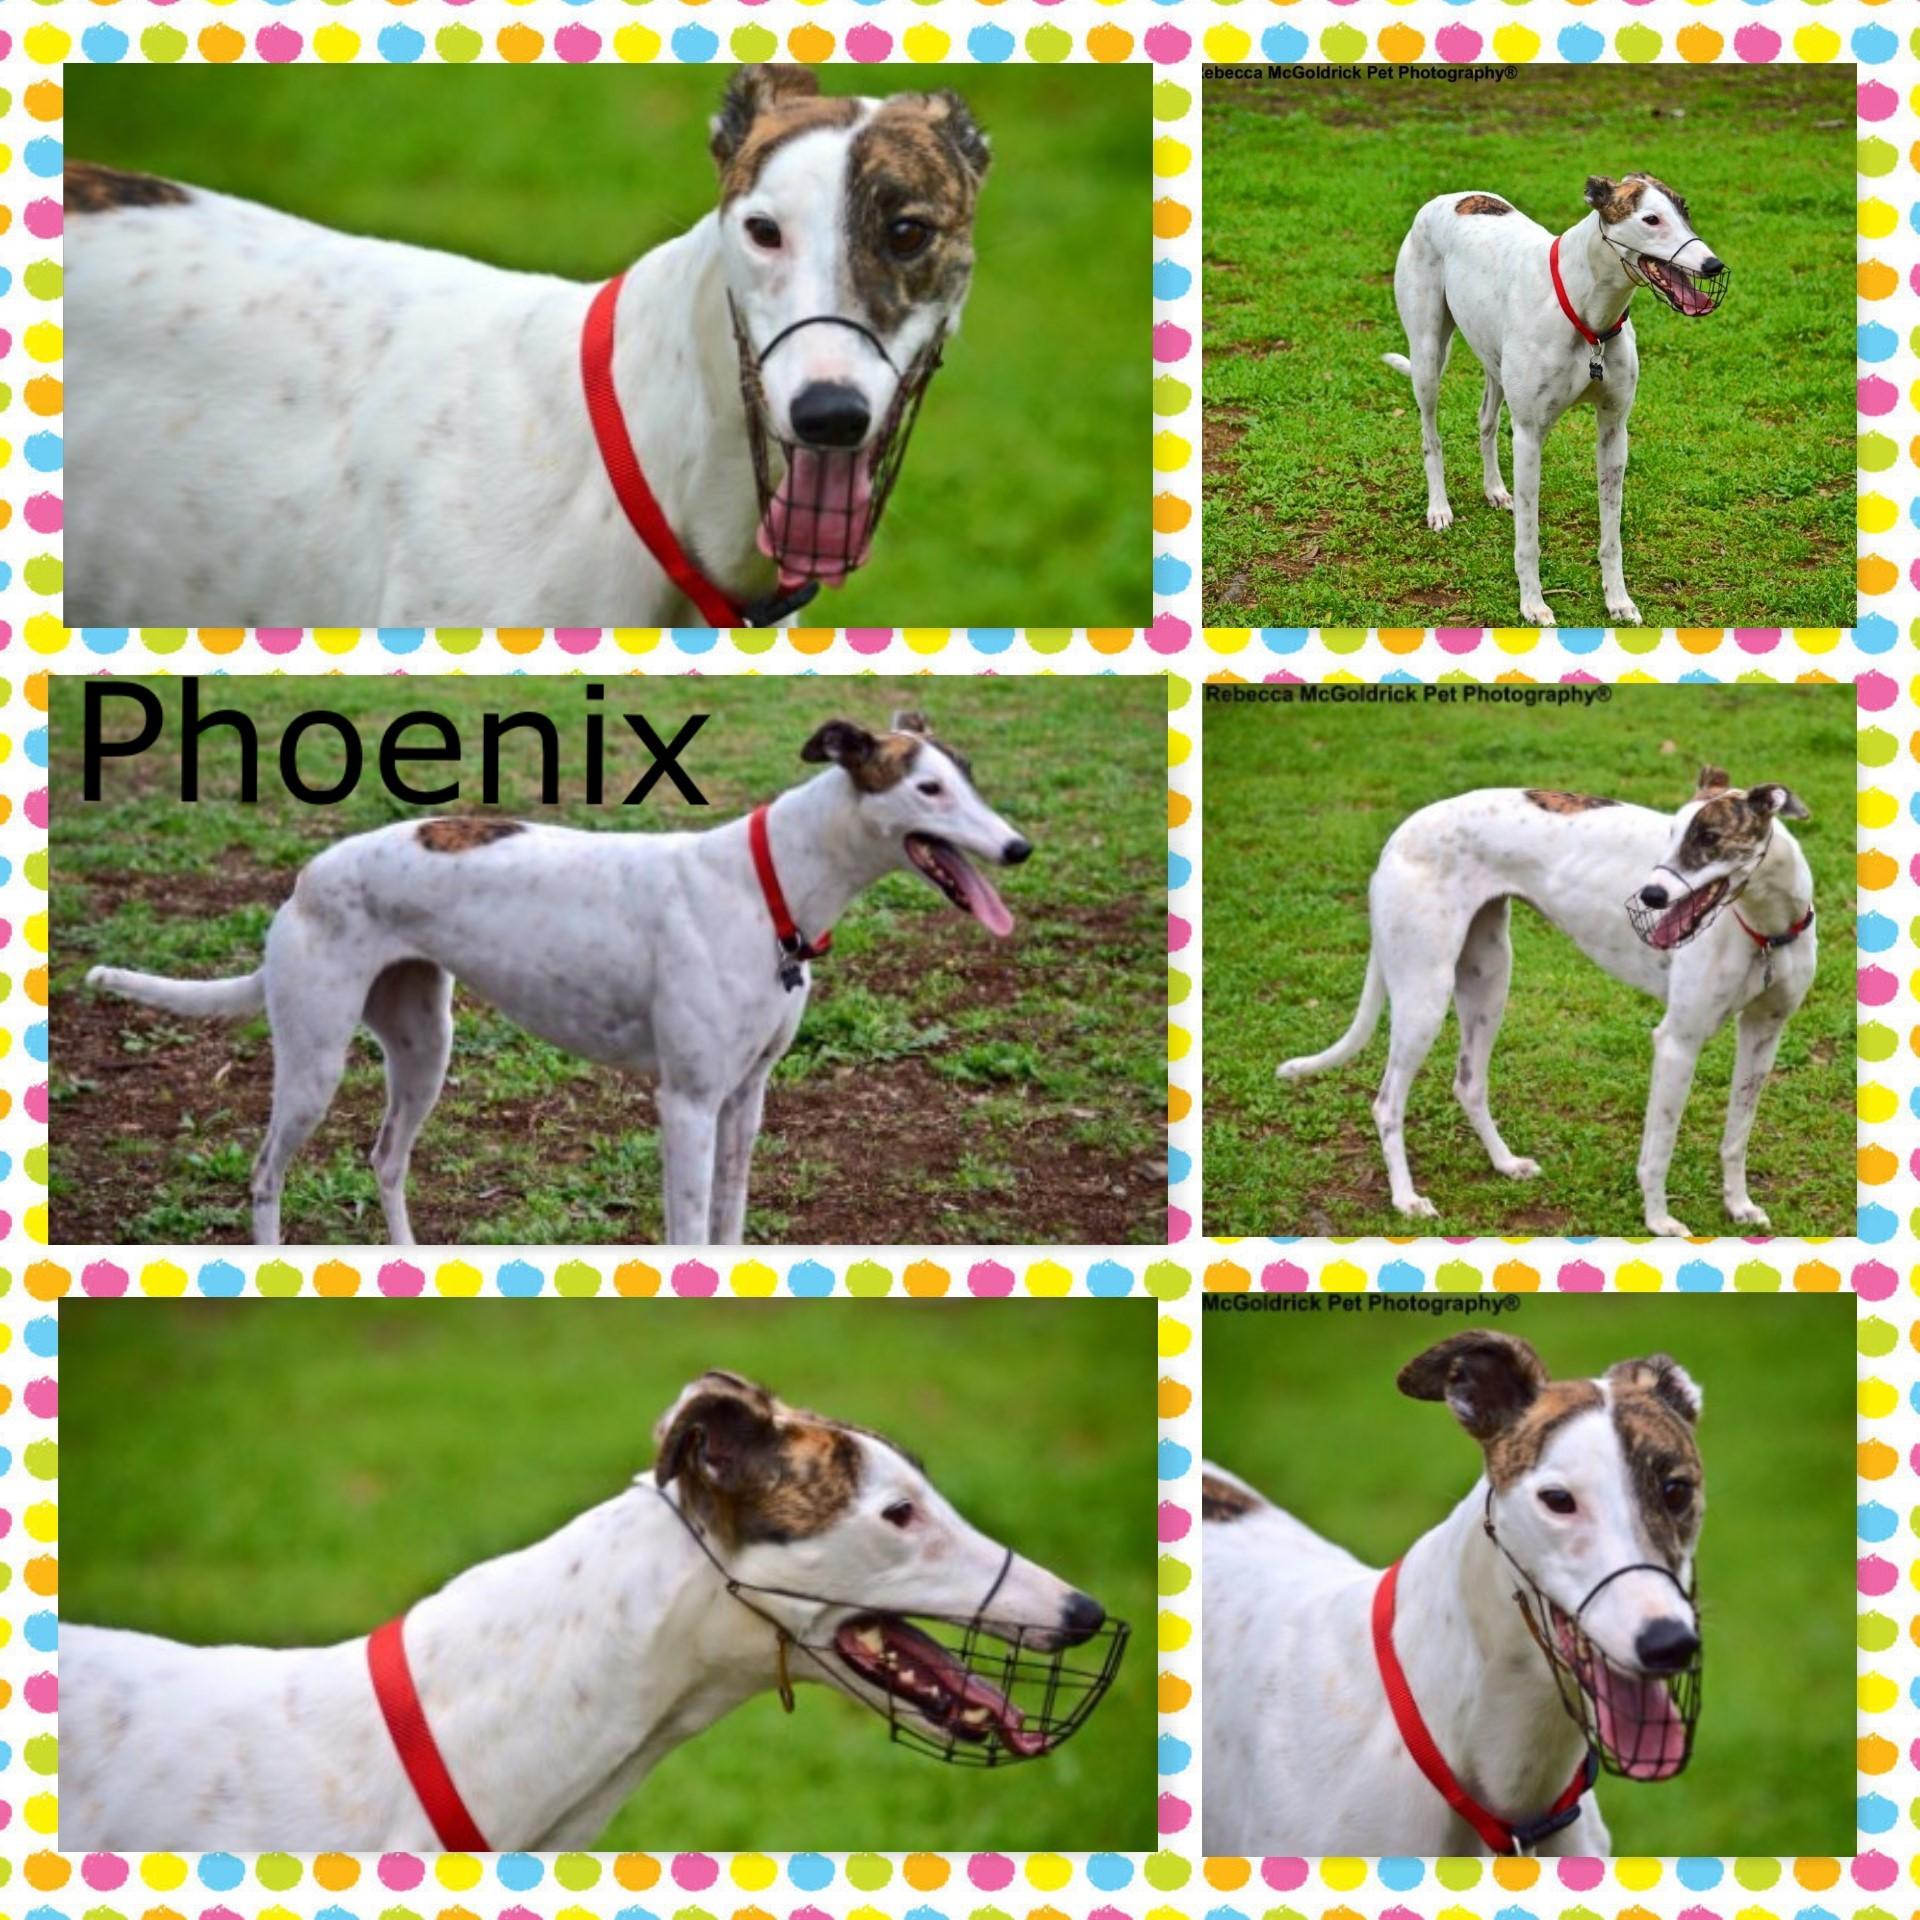 Phoenix (Select Phoenix)